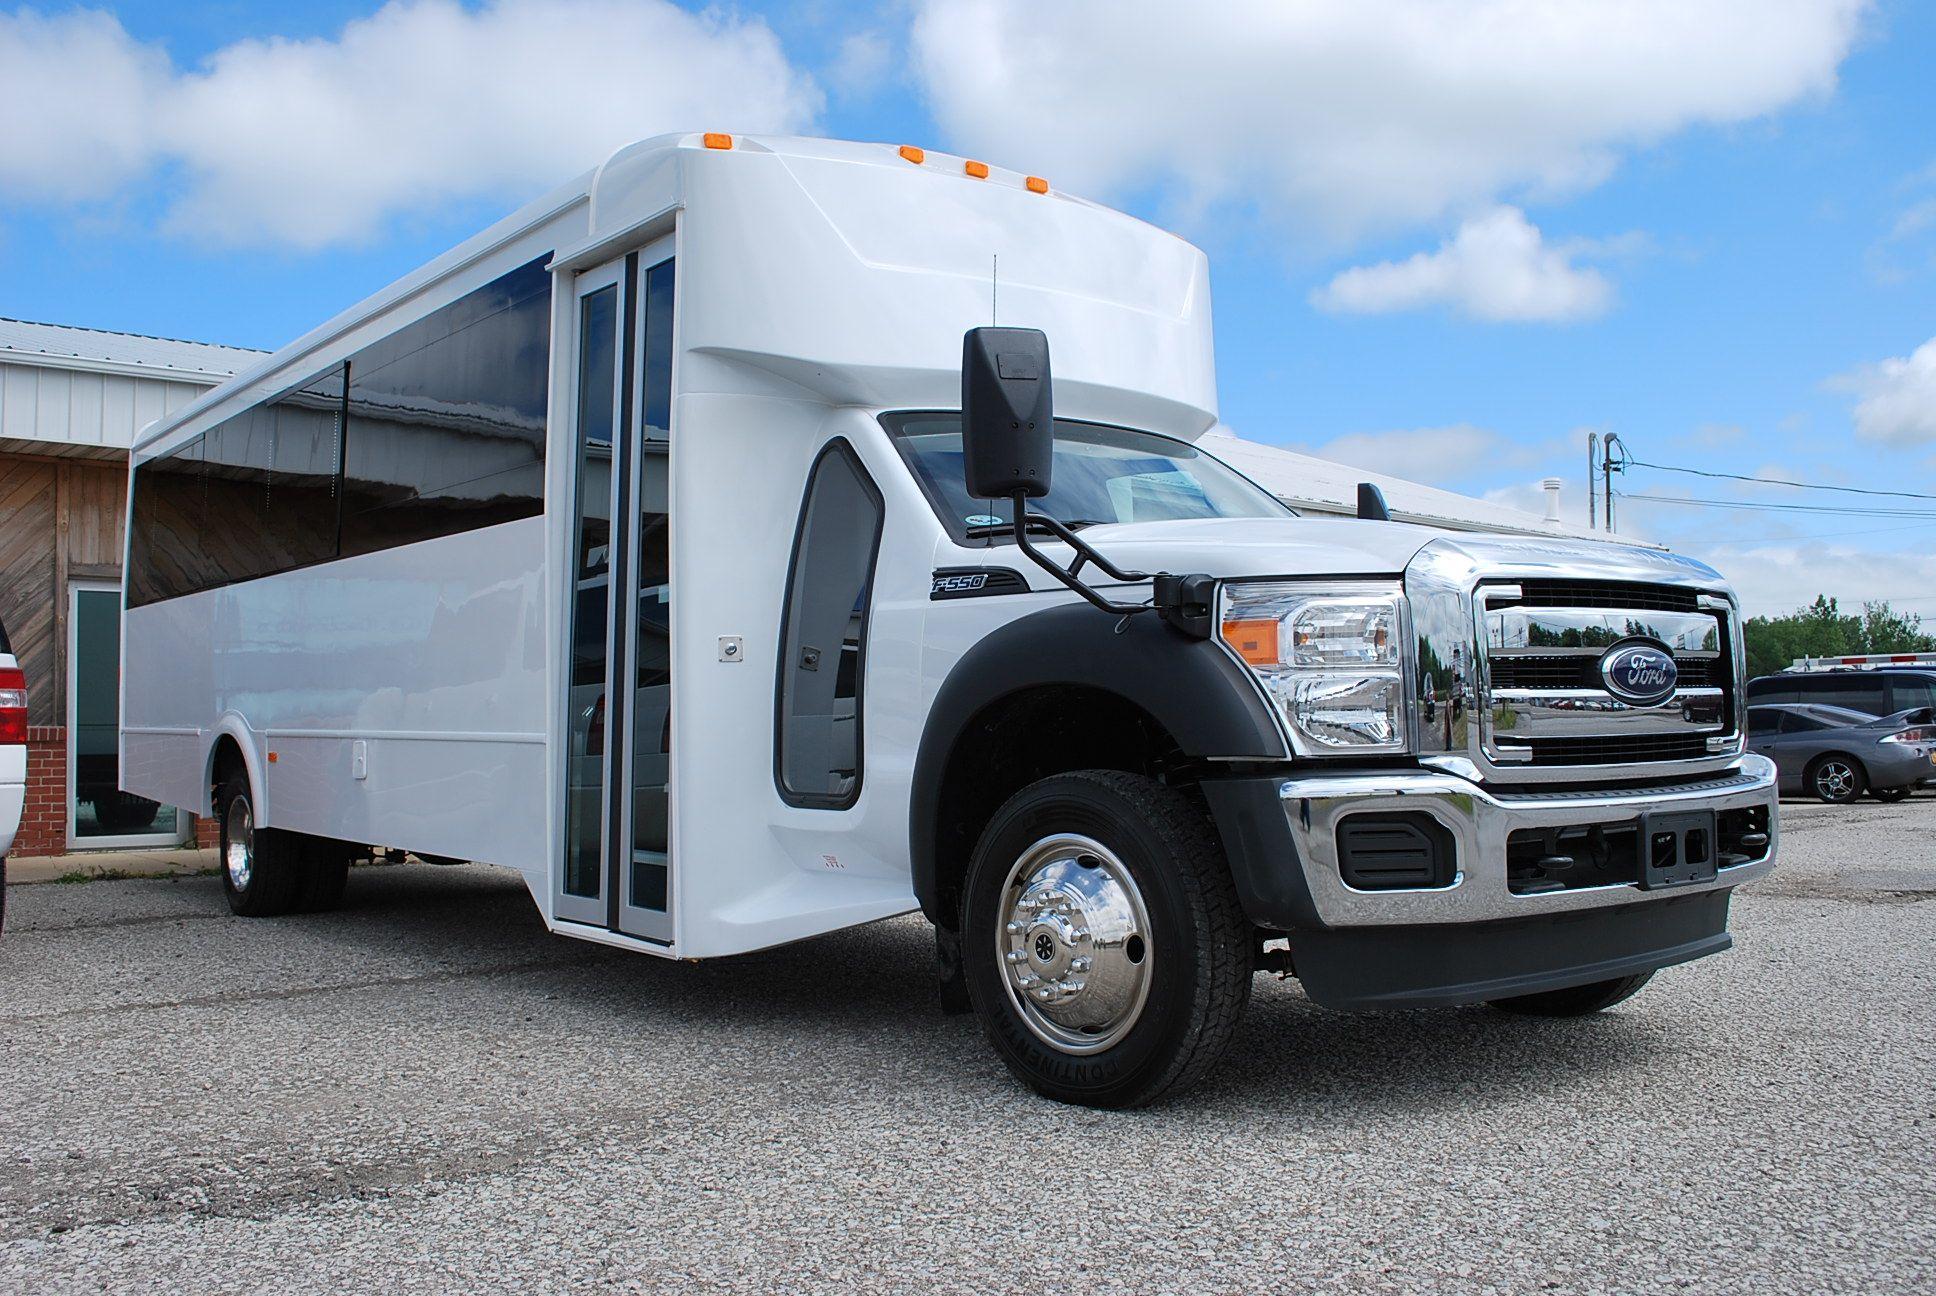 Party bus rentals dallas tx party buses party bus